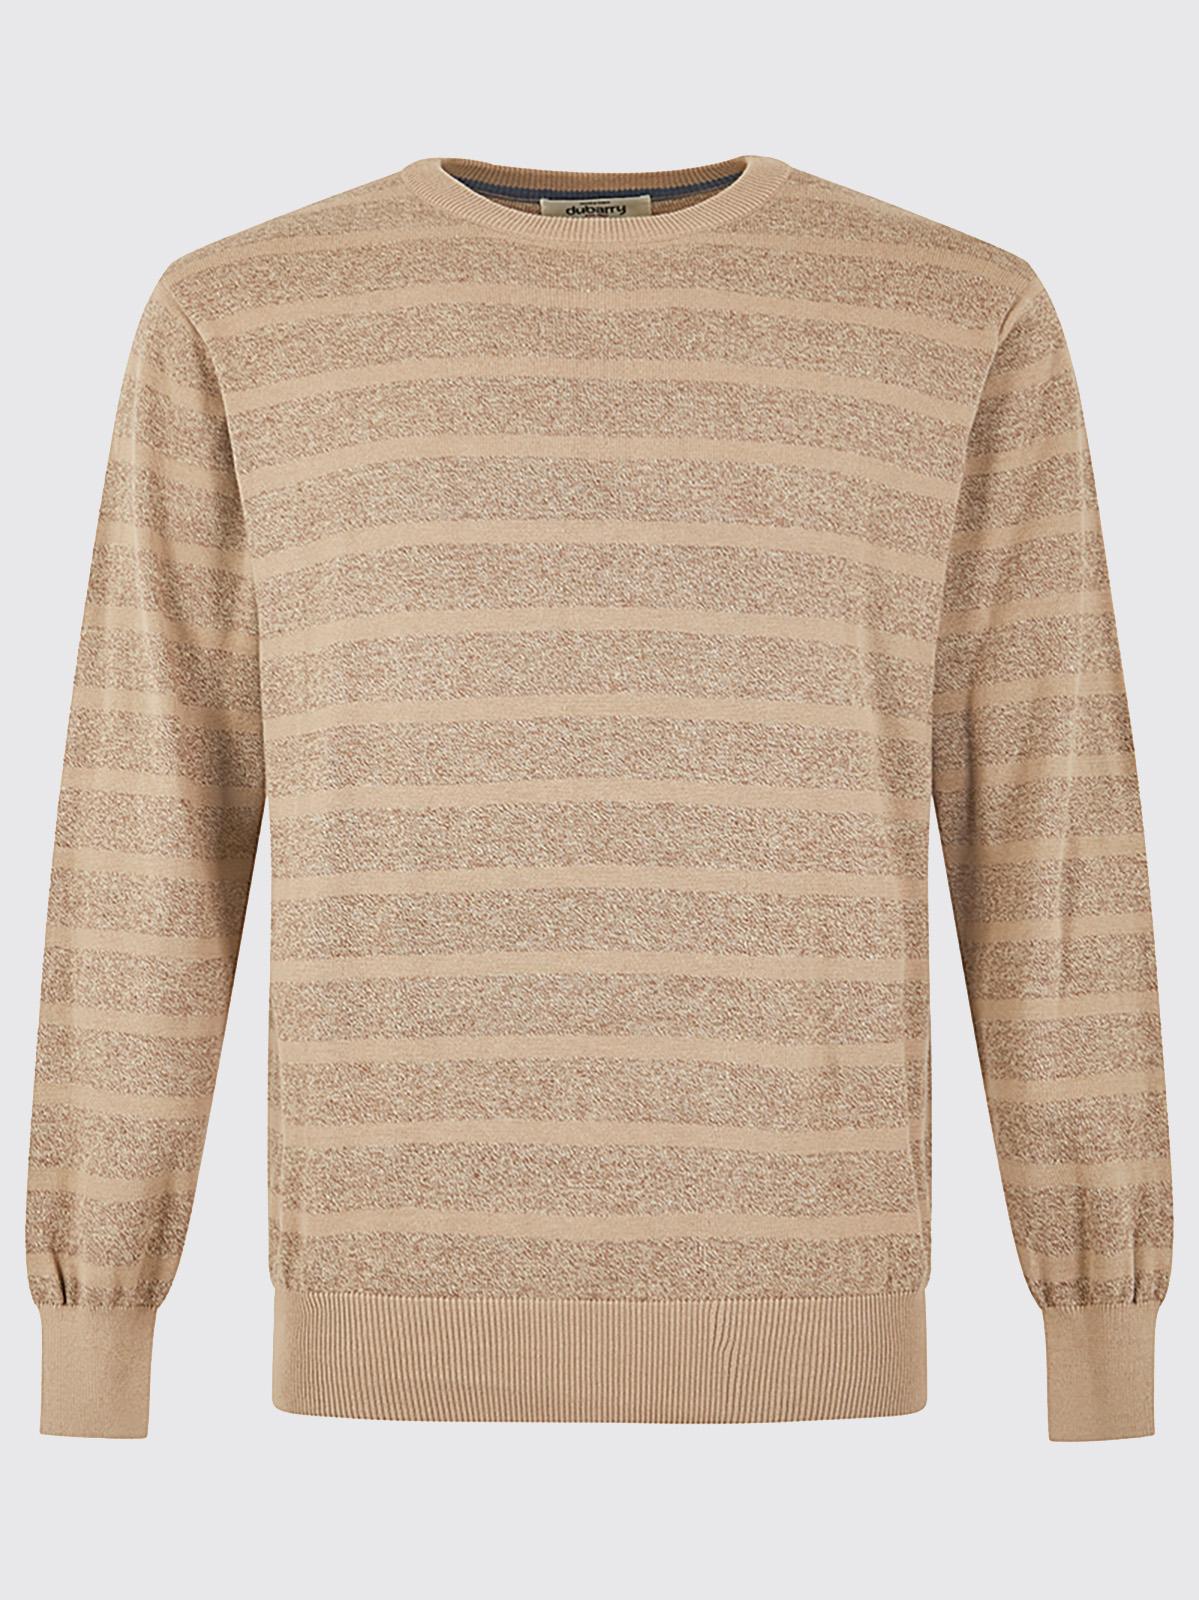 Avondale Sweater - Tan Multi